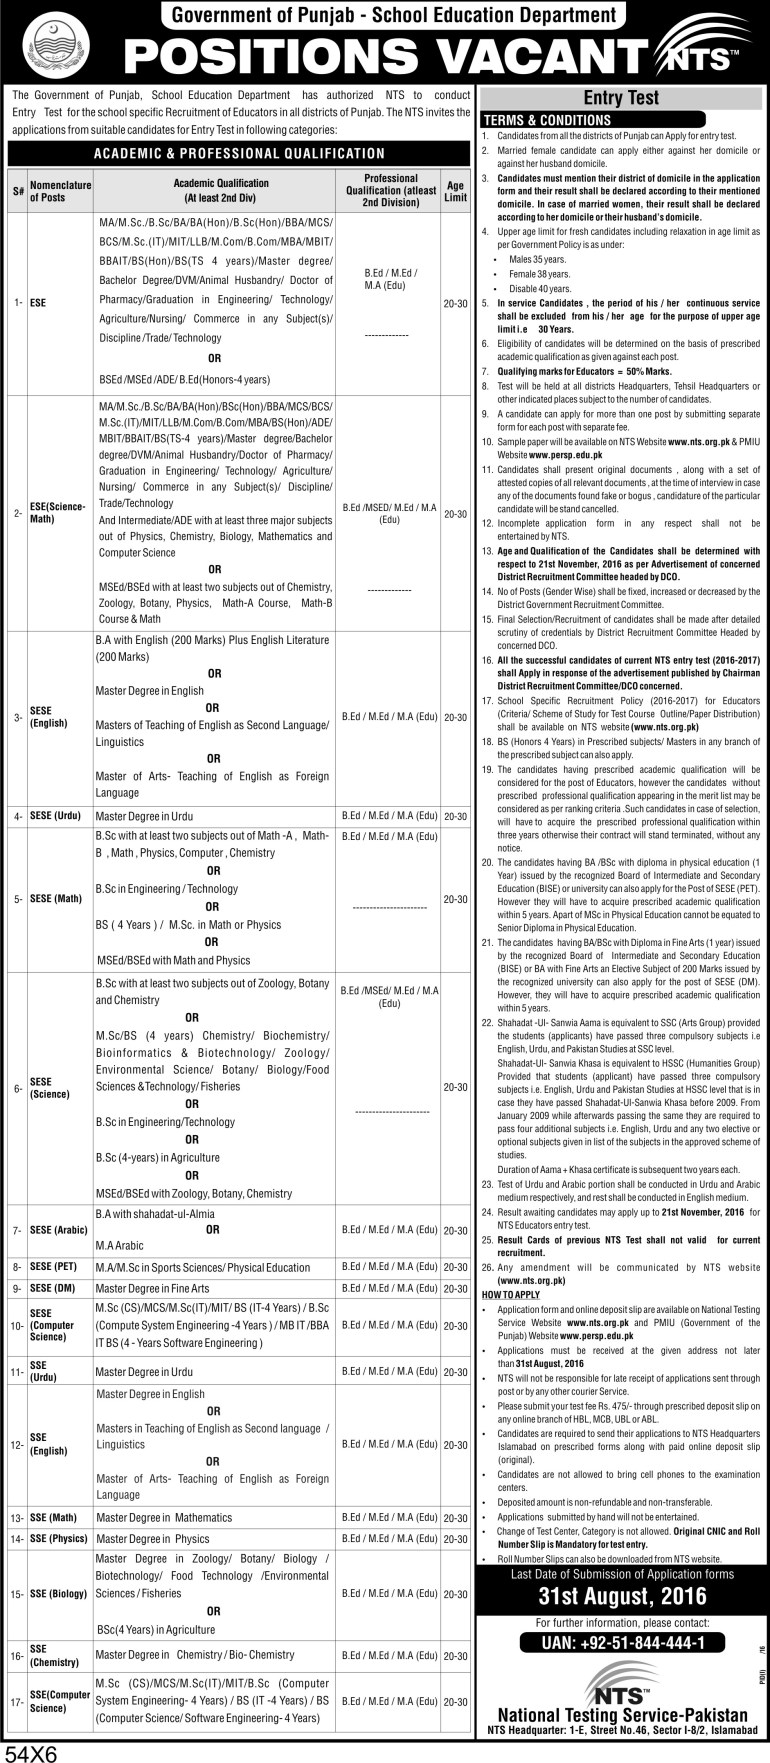 Punjab Govt School Education Department Jobs 2016